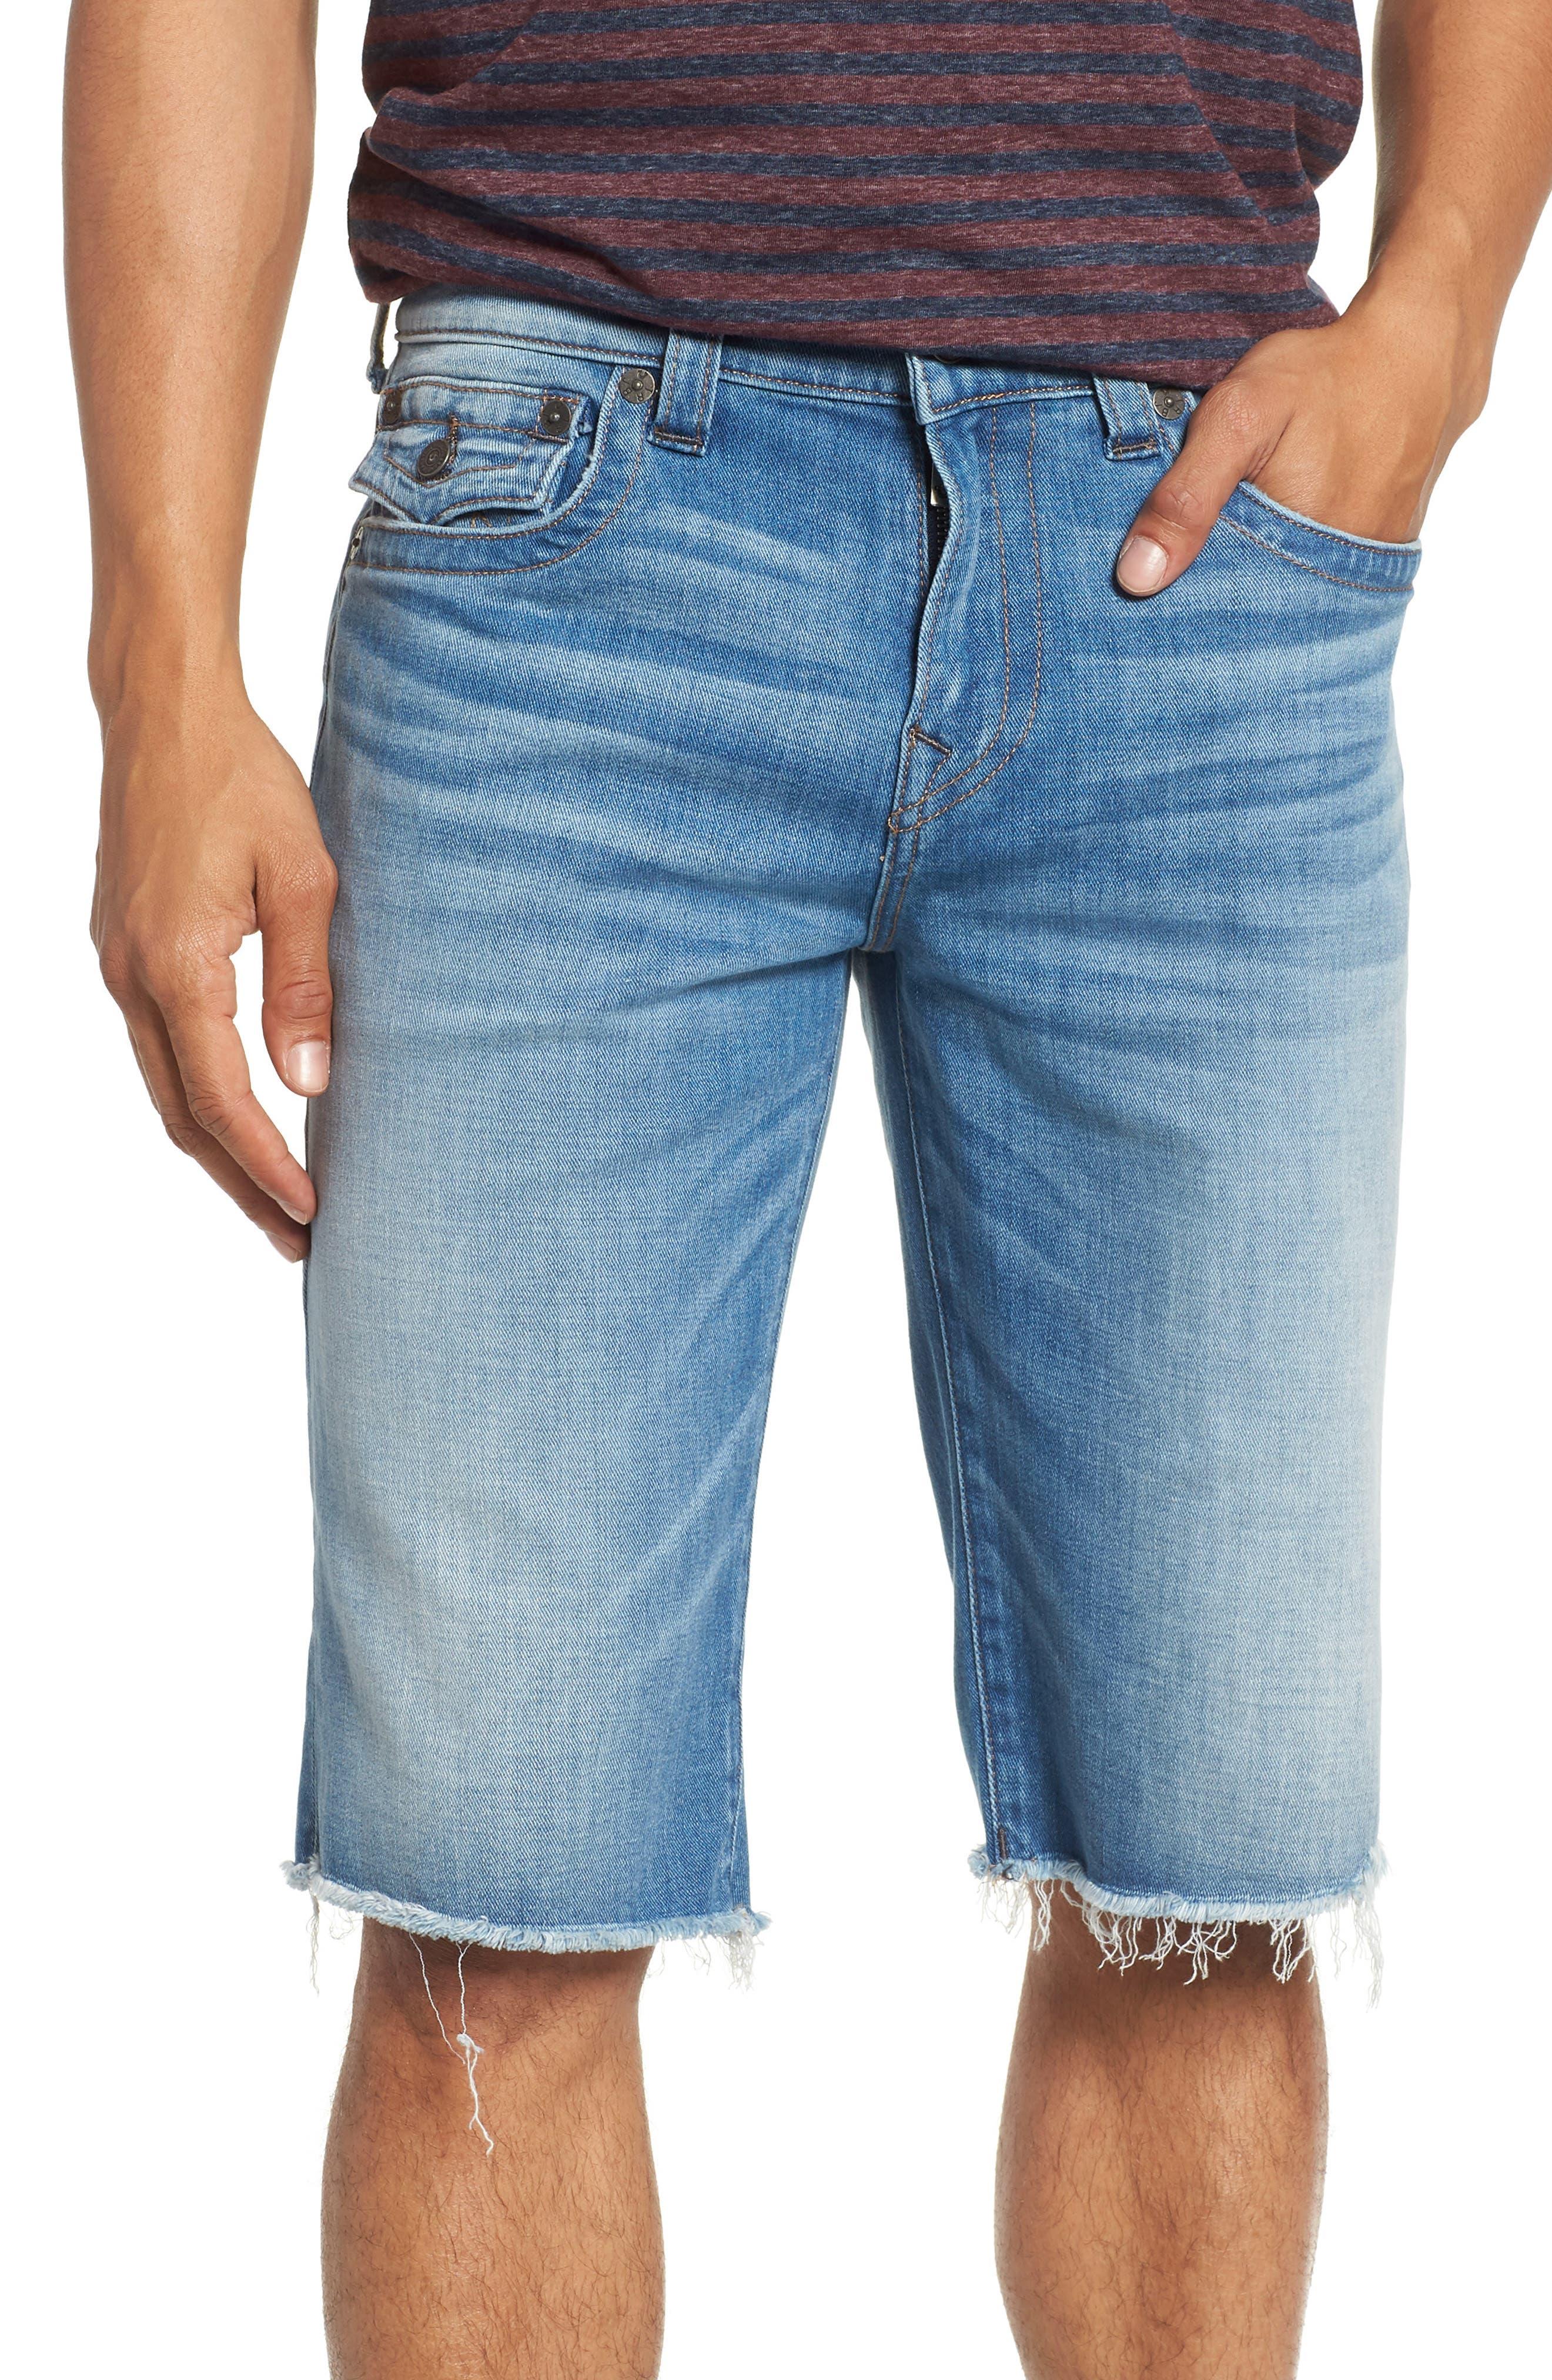 Ricky Flap Pocket Shorts,                         Main,                         color, Eqqm Flap Short